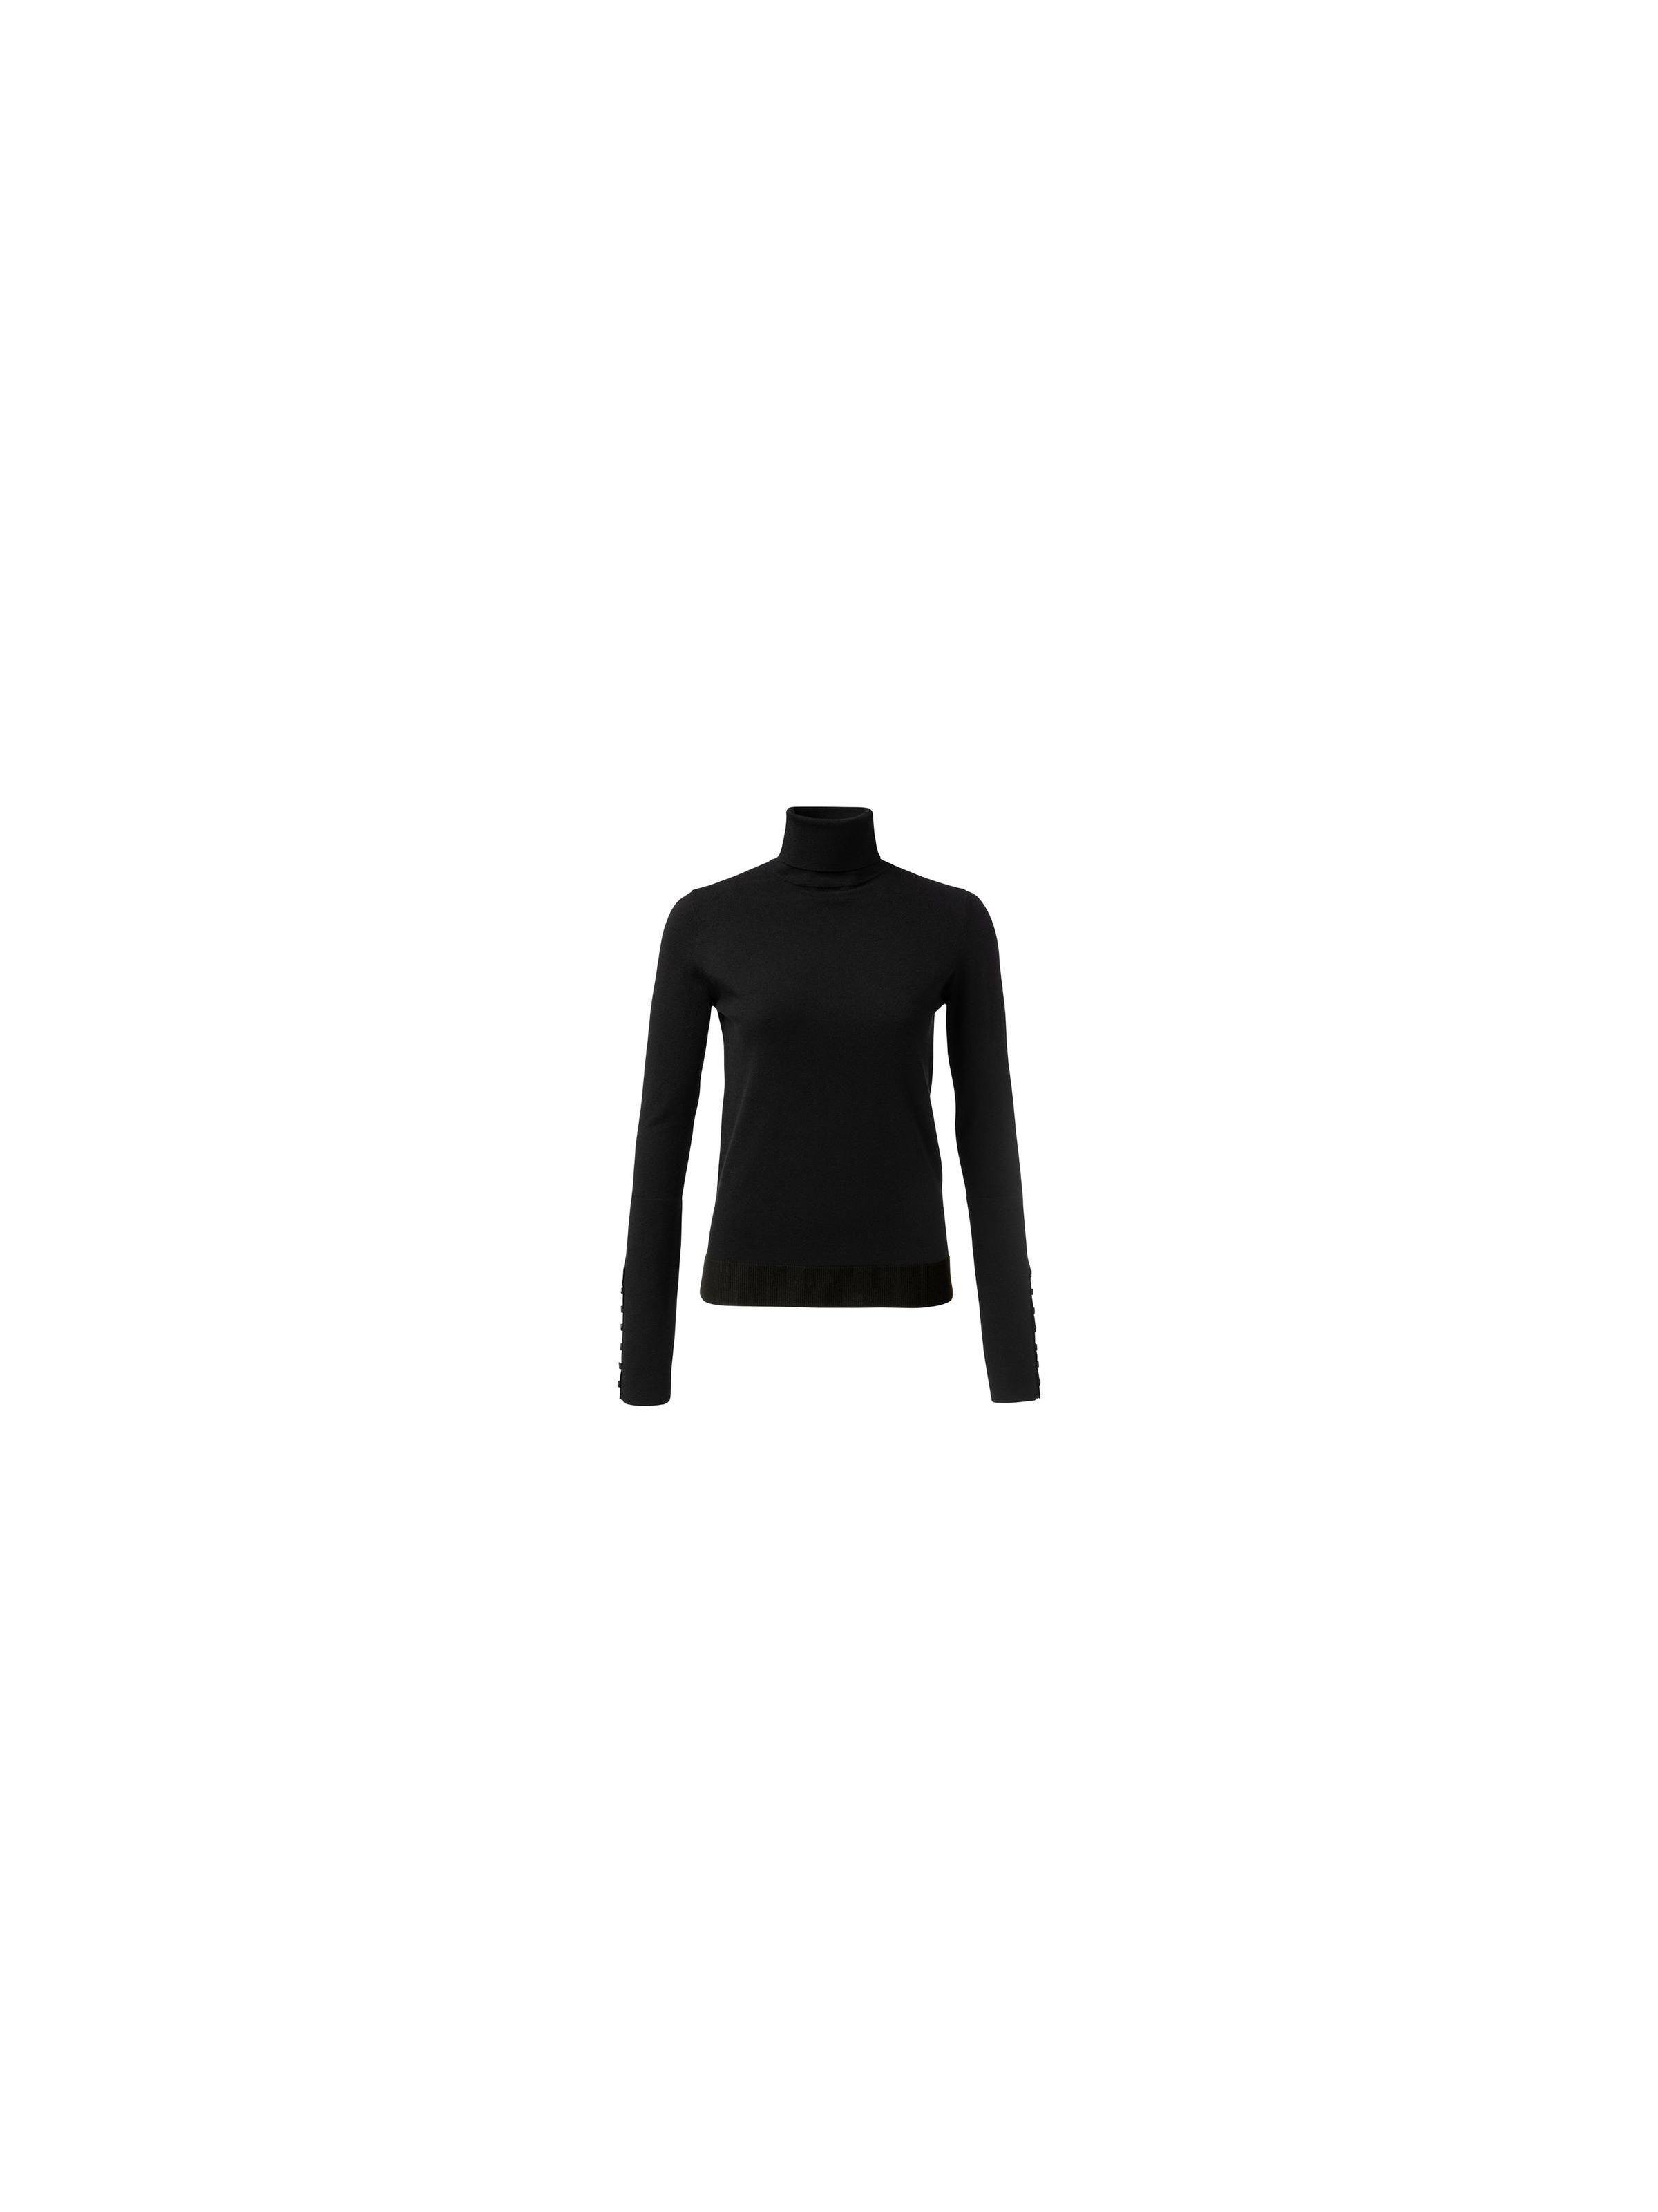 Zwarte dames trui Yaya - 1000216-122